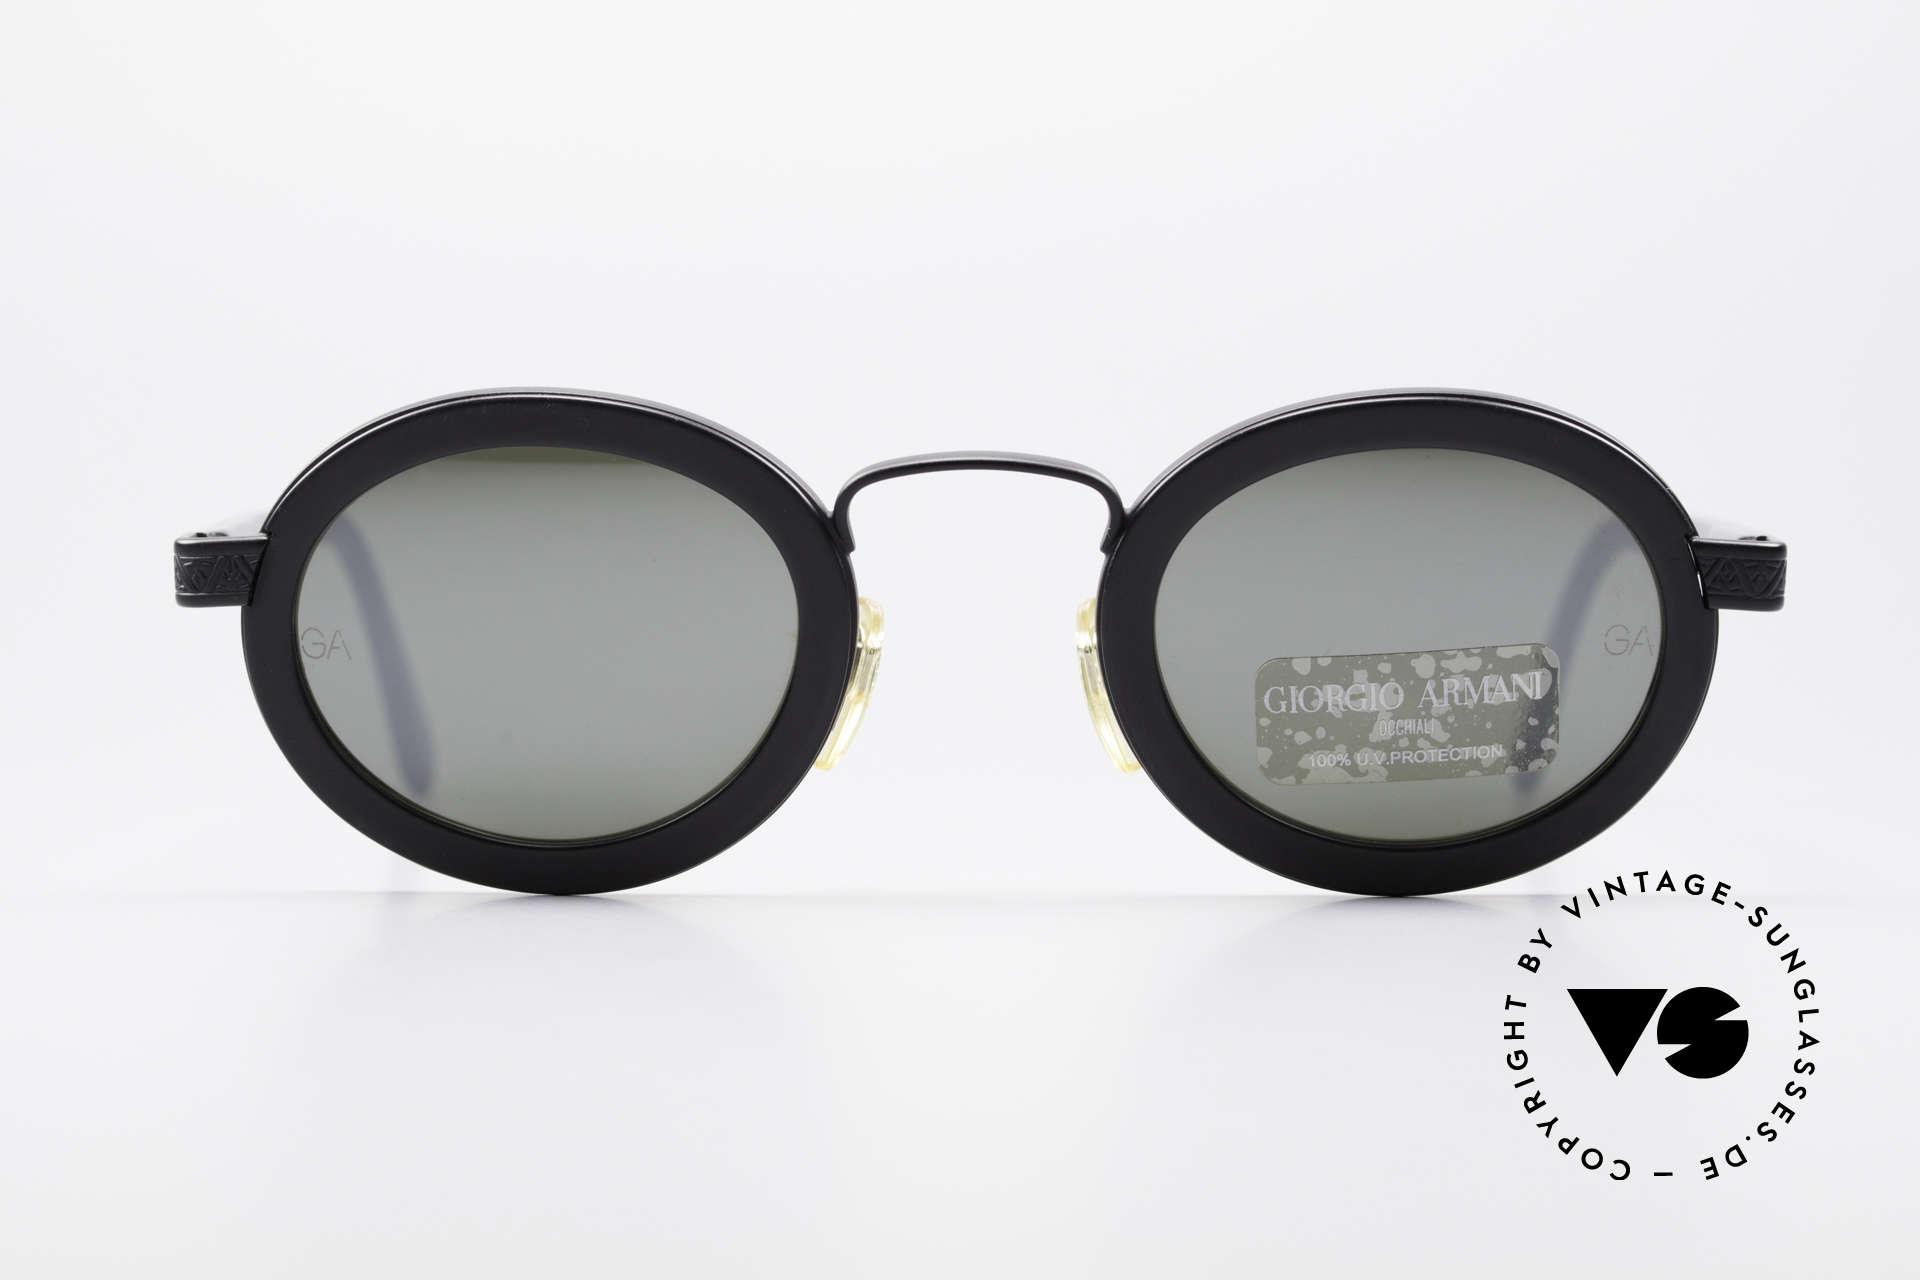 7bd3b18f2ac Sunglasses Giorgio Armani 631 Oval 90s Sunglasses Mirrored